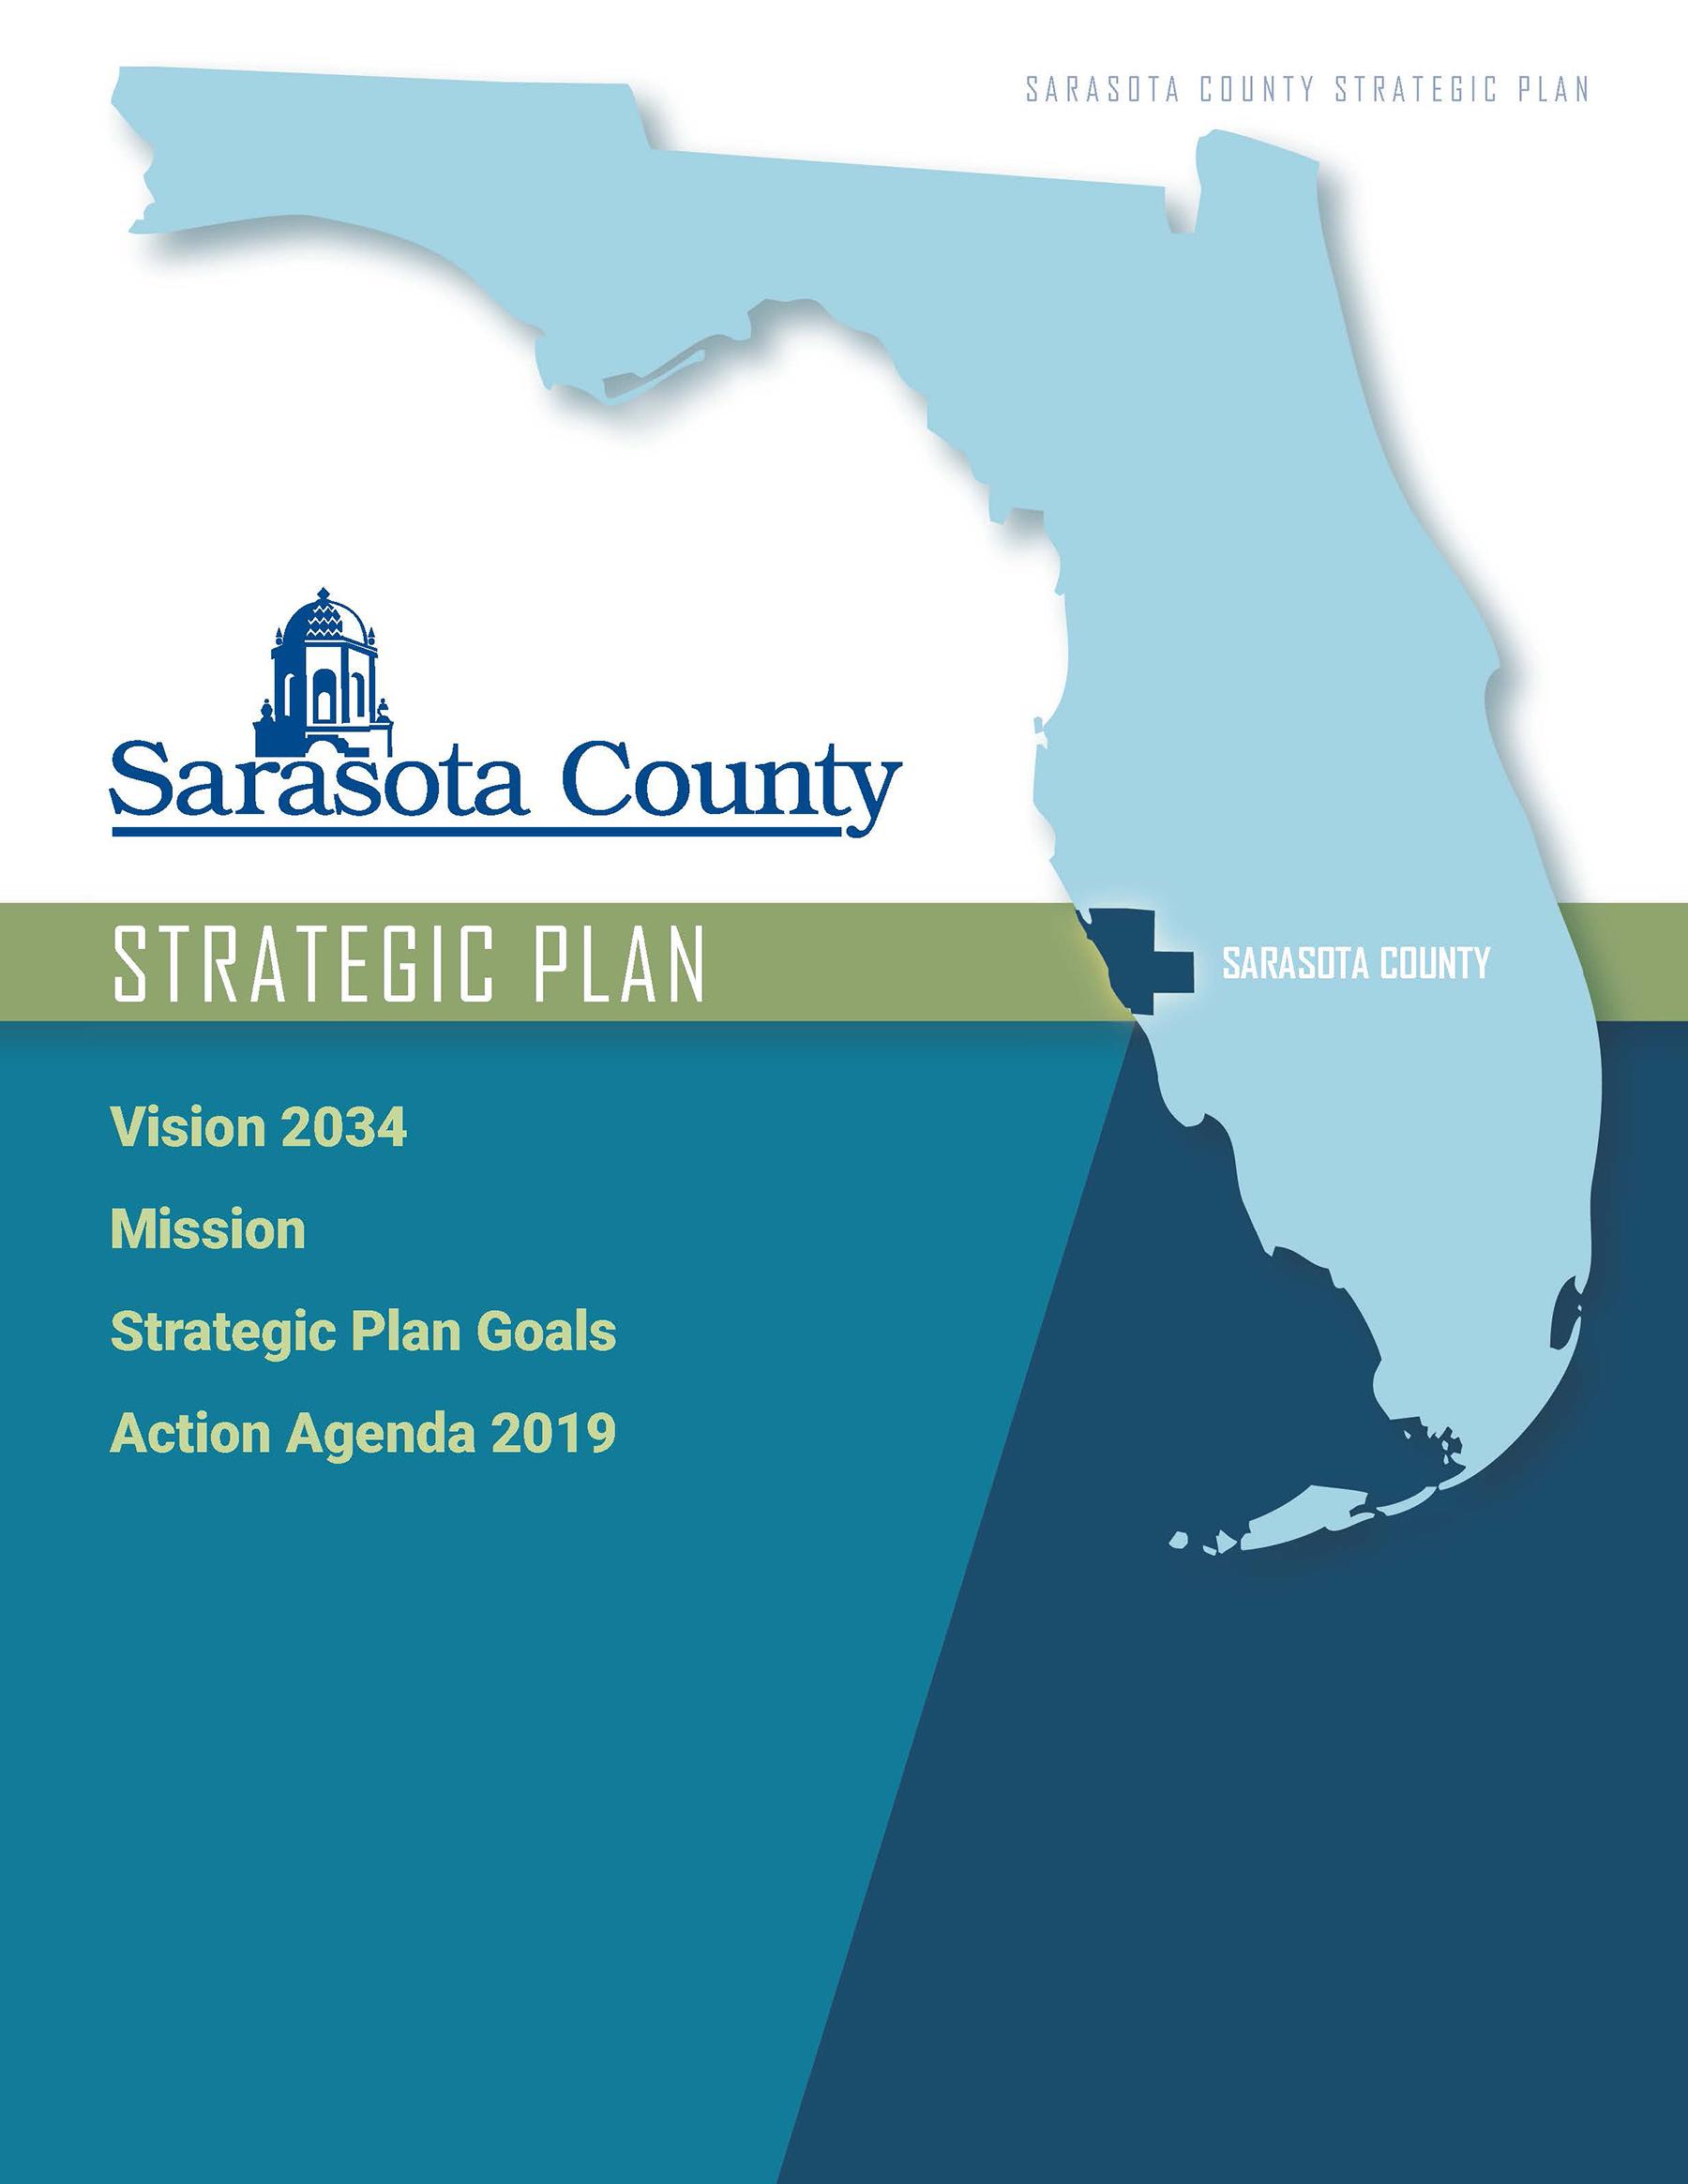 Sarasota County Strategic Plan Cover